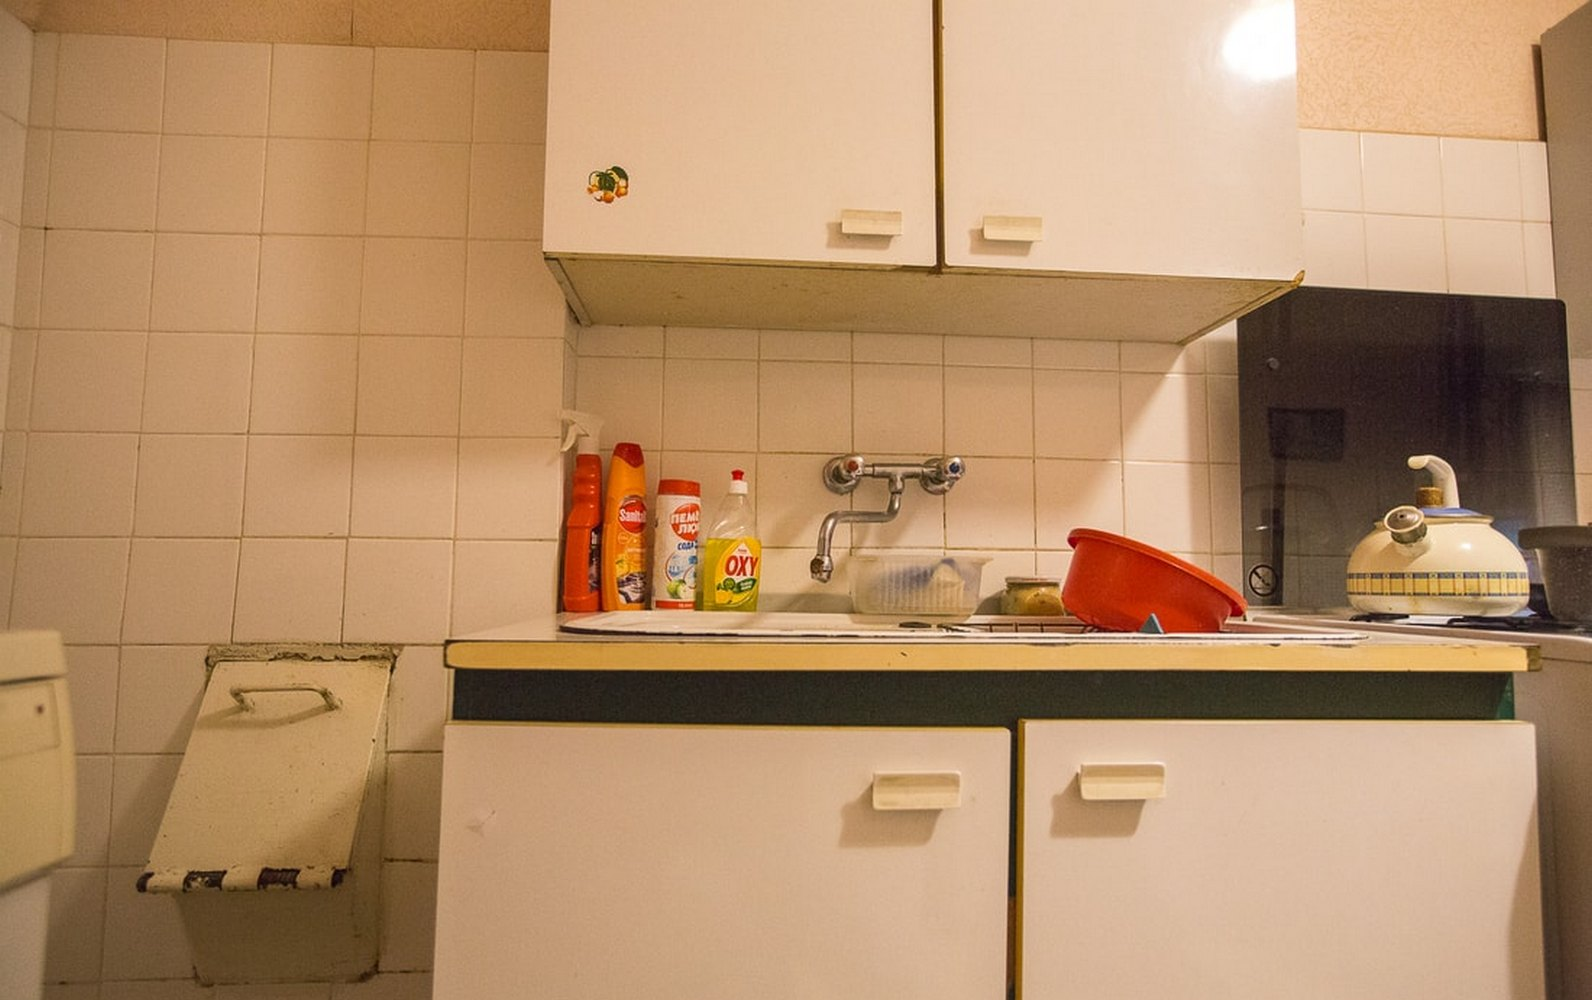 мусоропровод на кухне